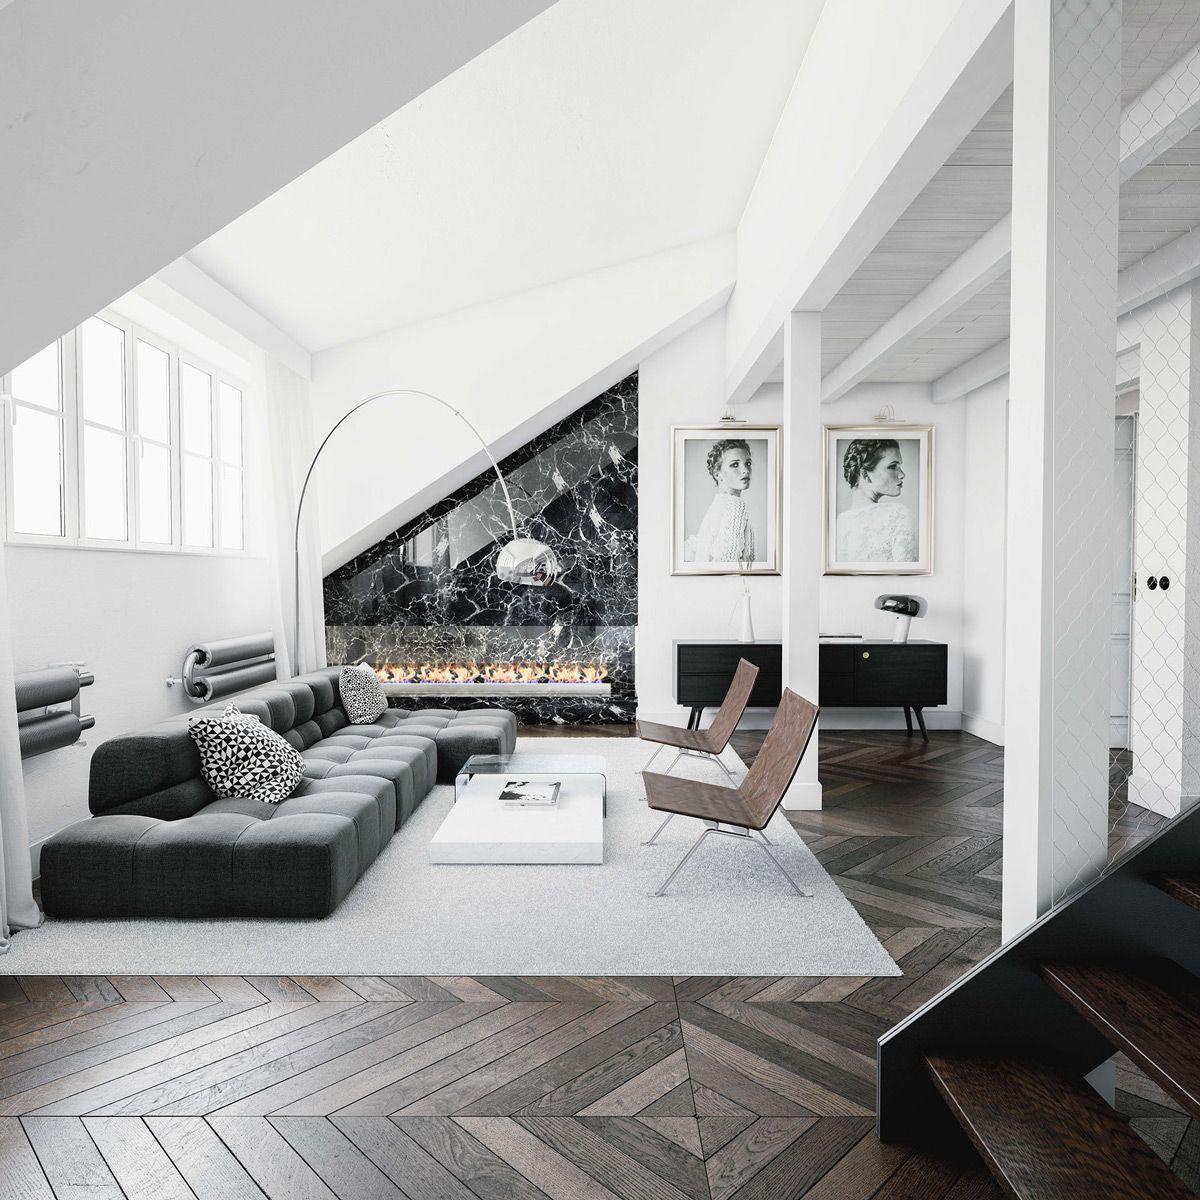 homedesigning via 30 black white living rooms on beautiful modern black white living room inspired id=96693